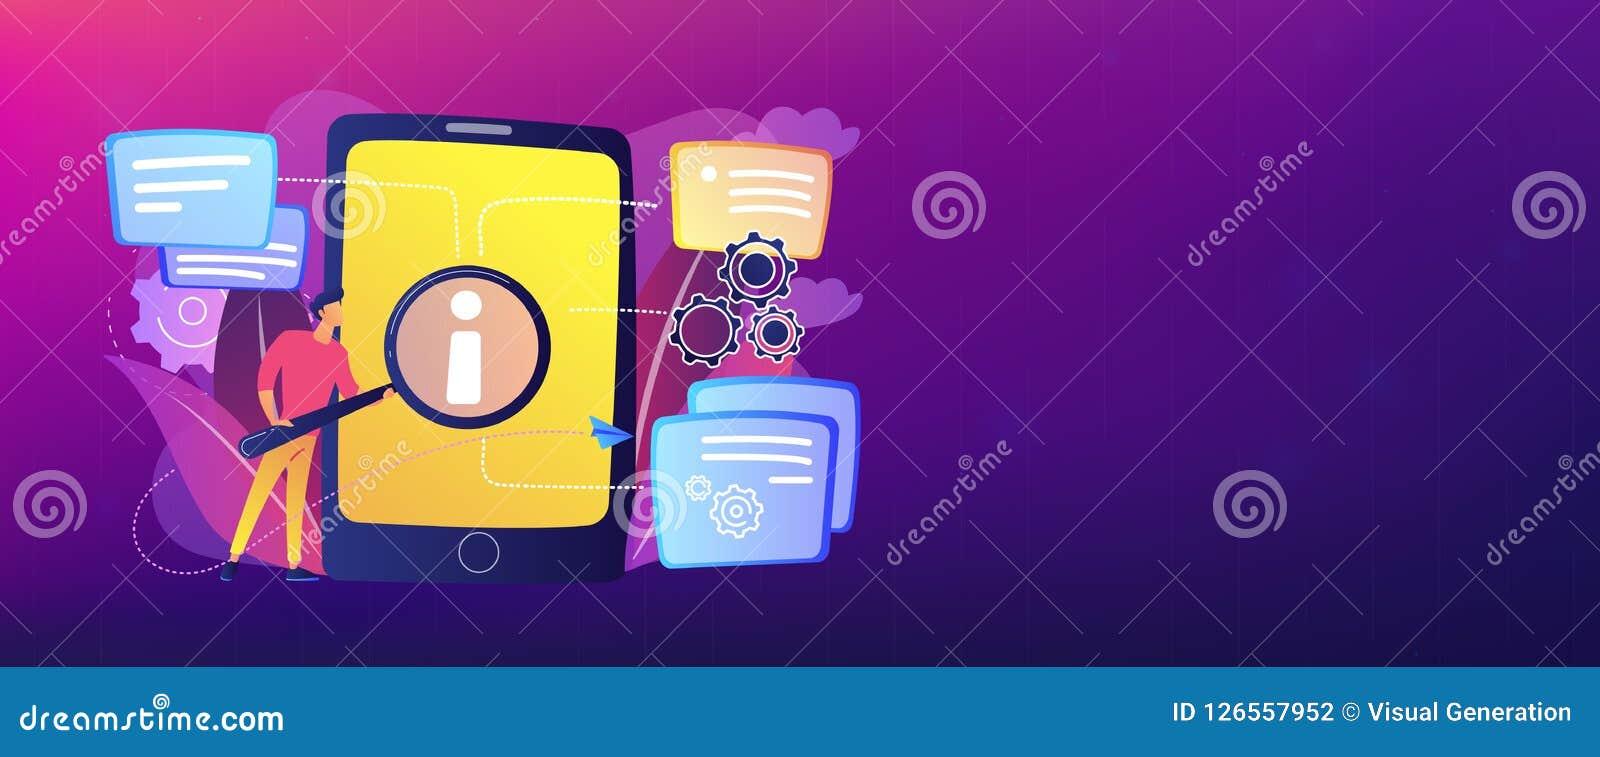 User guide header banner. stock vector. Illustration of element ...